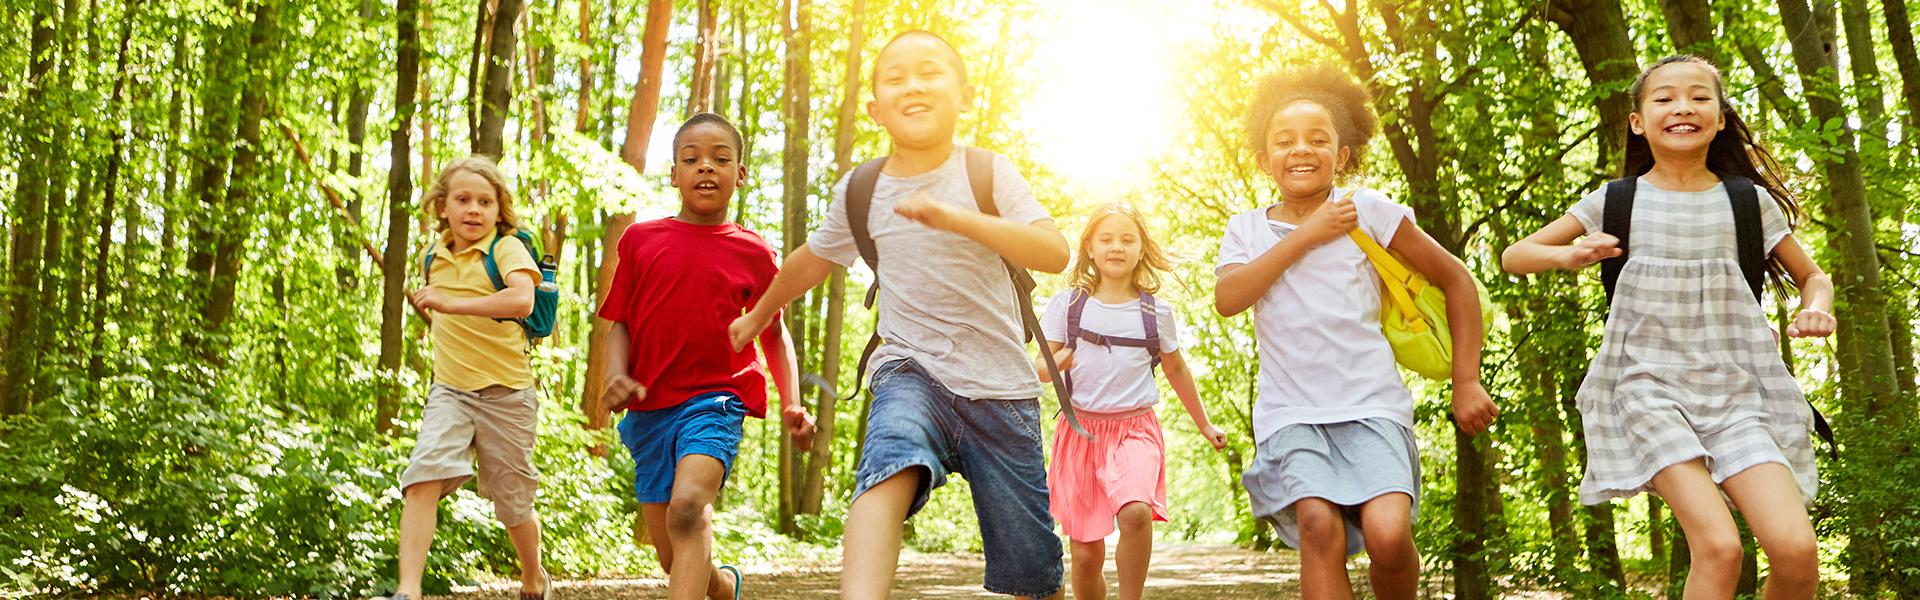 Children running with smile